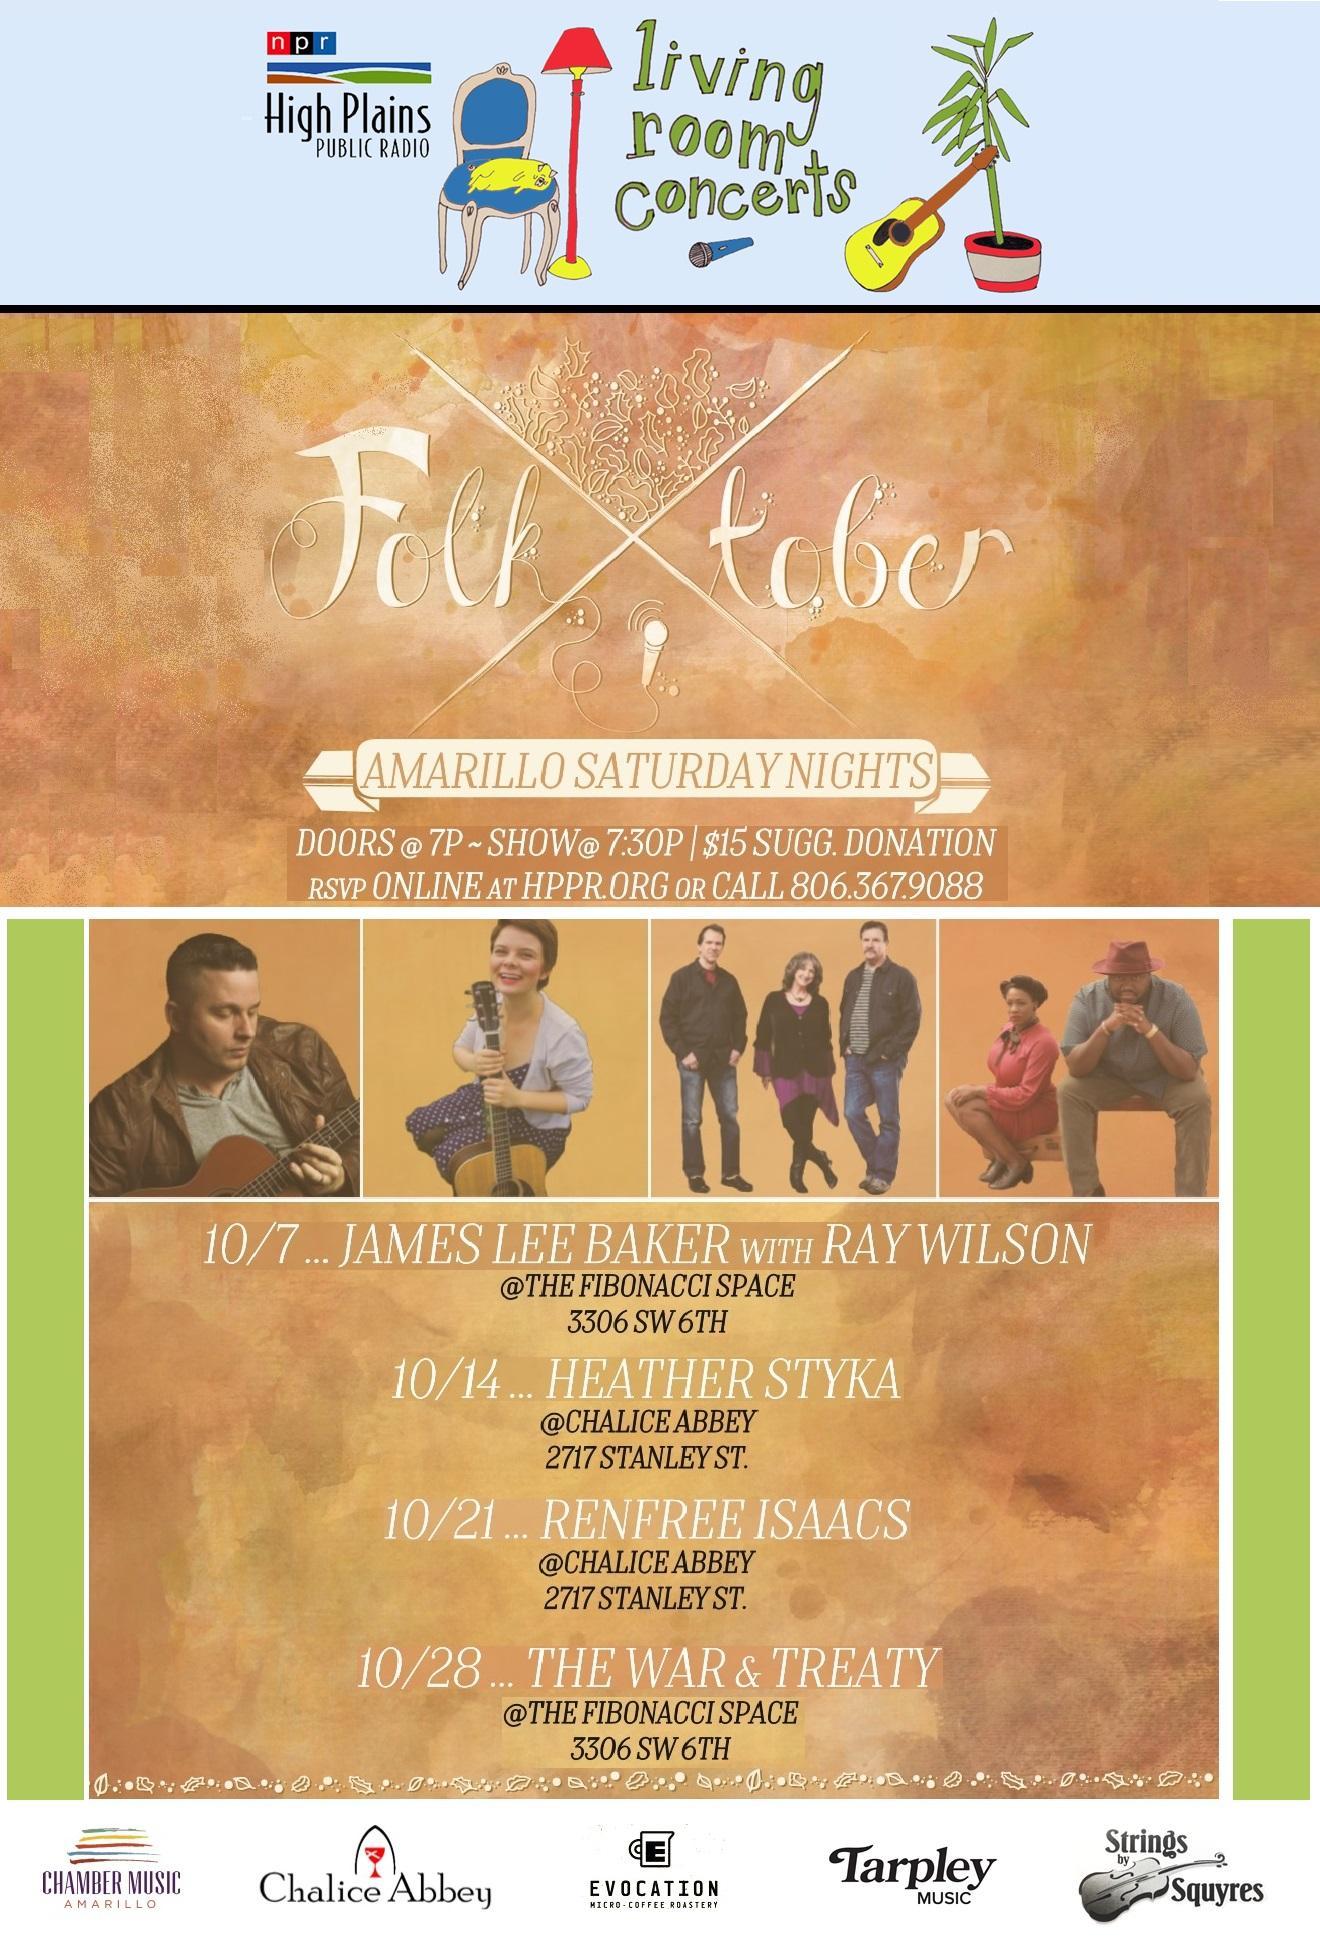 living room concerts. Folk Tober Saturday Nights  Living Room Concerts in Amarillo HPPR